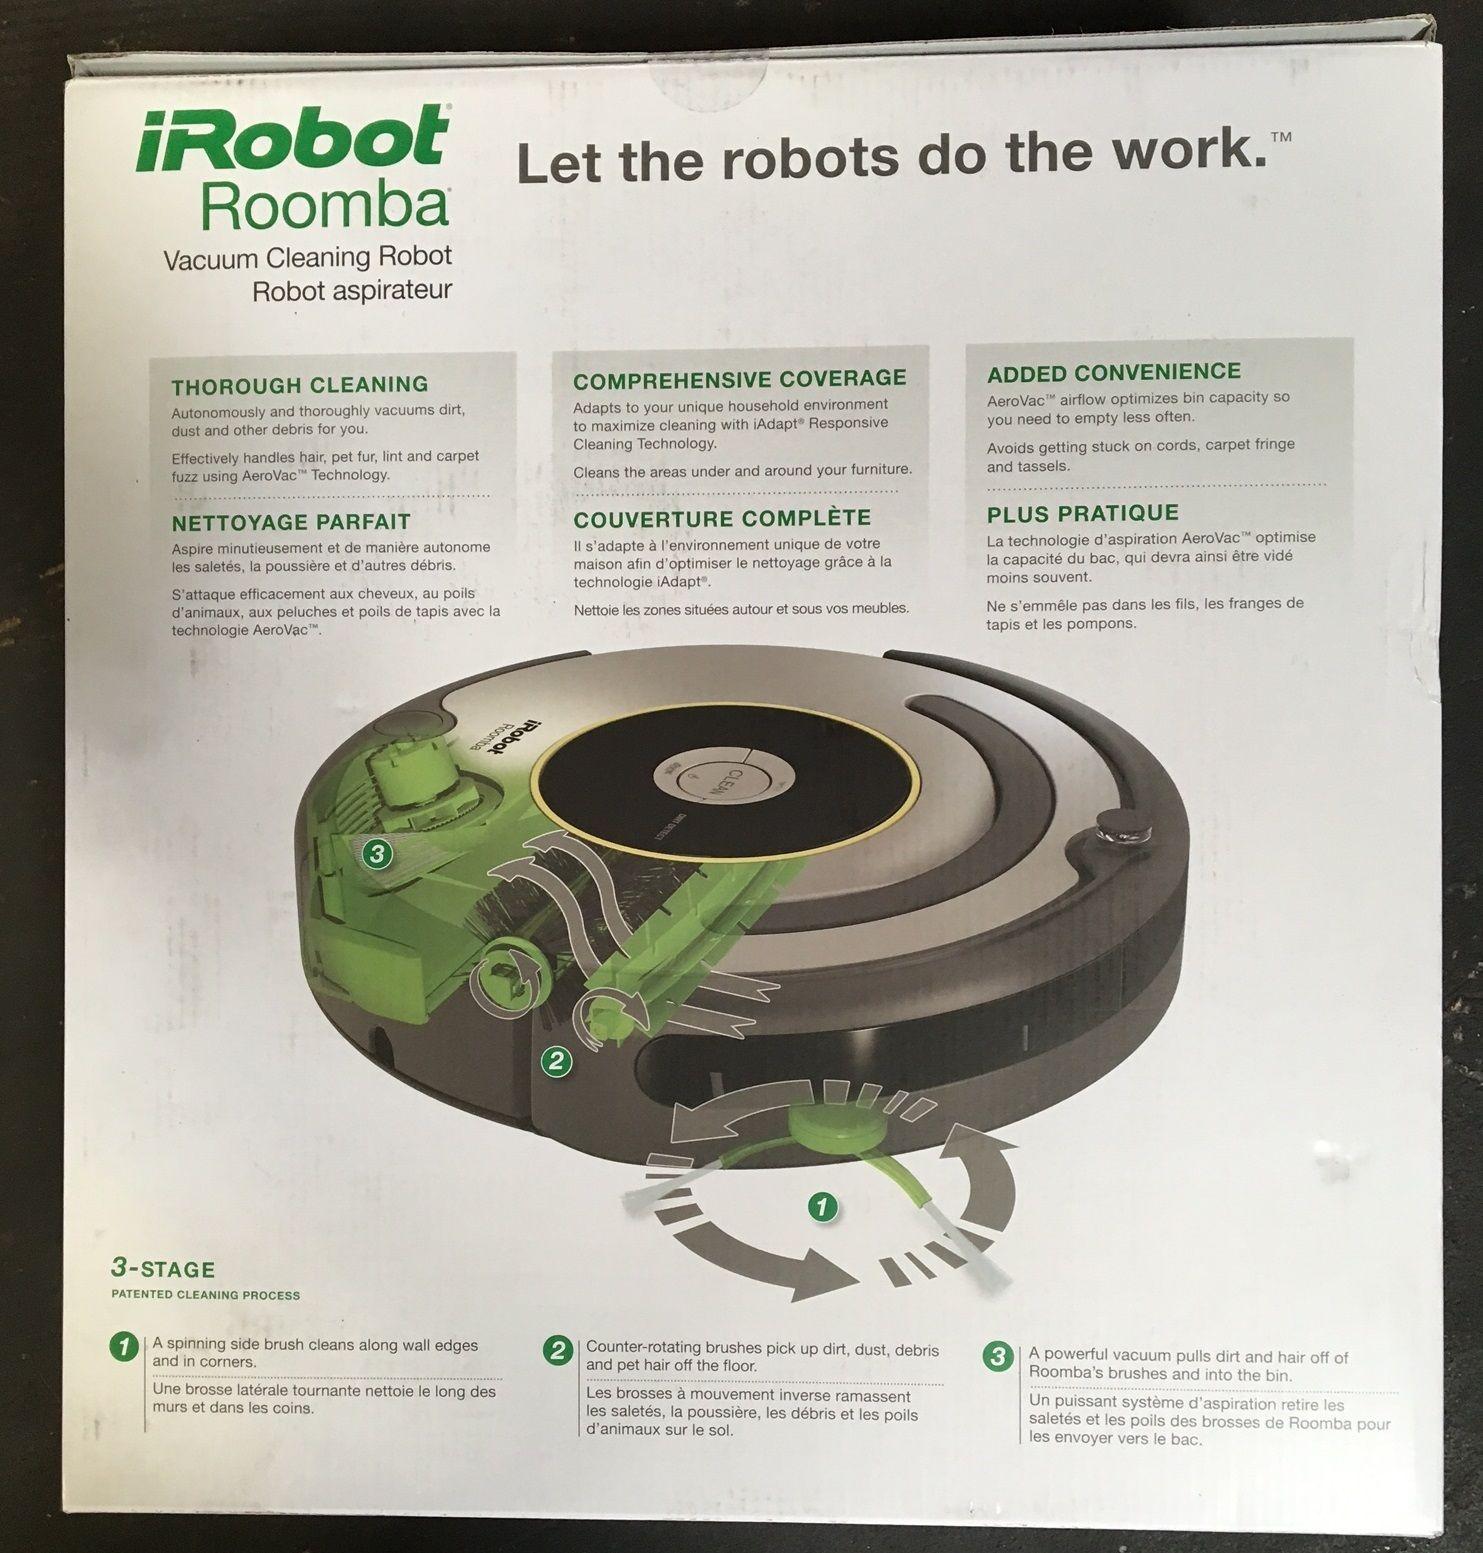 irobot roomba 650 vacuum cleaning robot brand new r650020 - Irobot Roomba 650